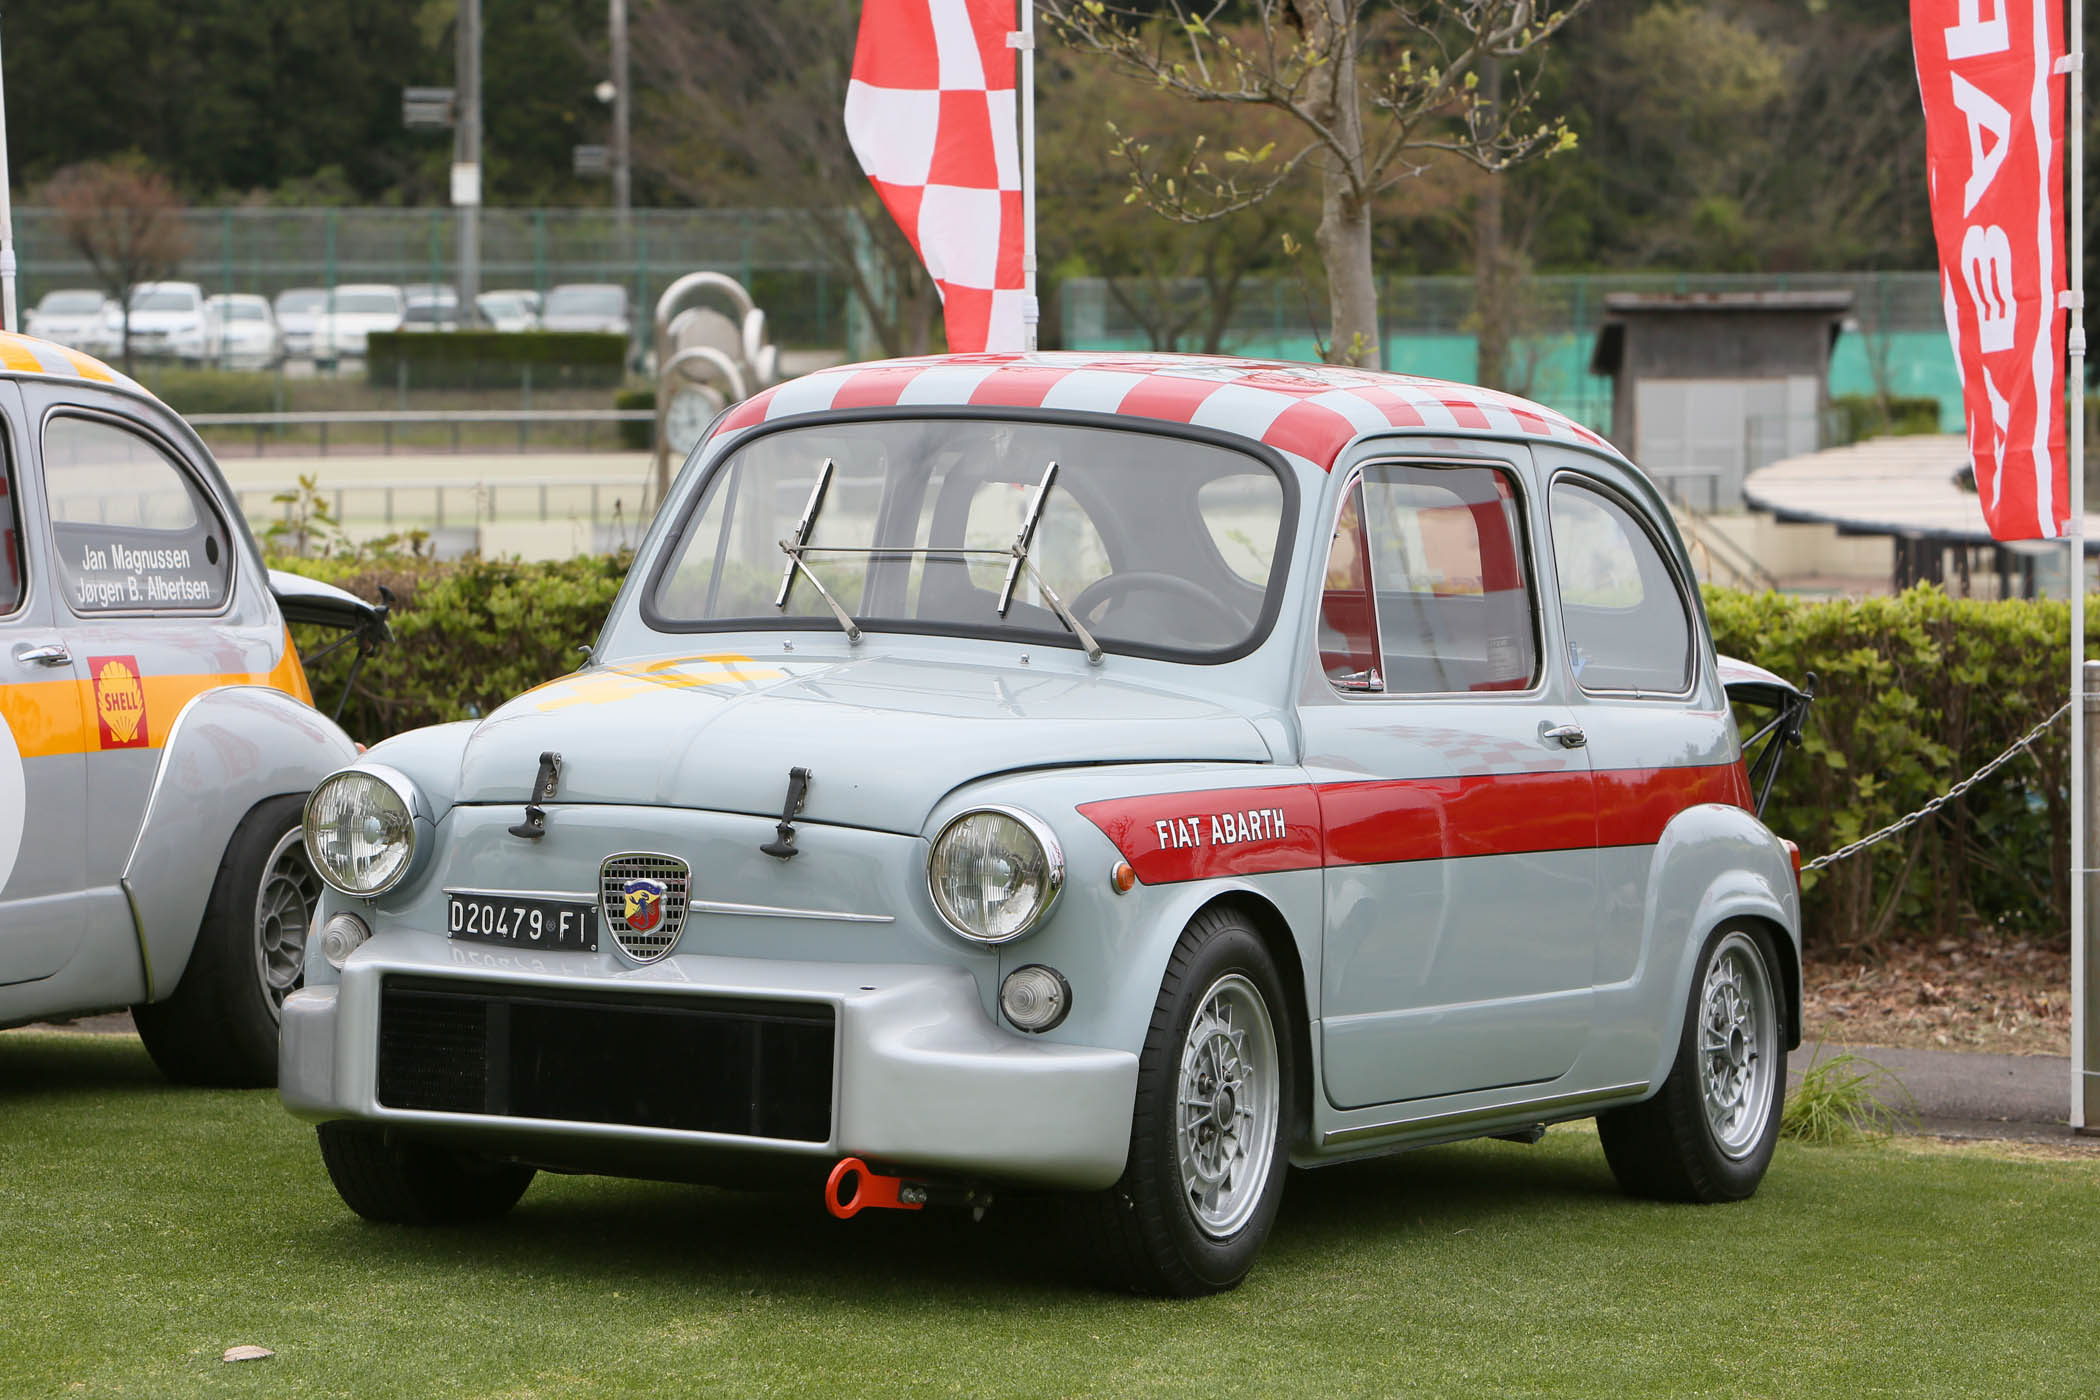 1966 FIAT ABARTH 1000 BERLINA CORSA|アバルトの歴史を刻んだモデル No.011